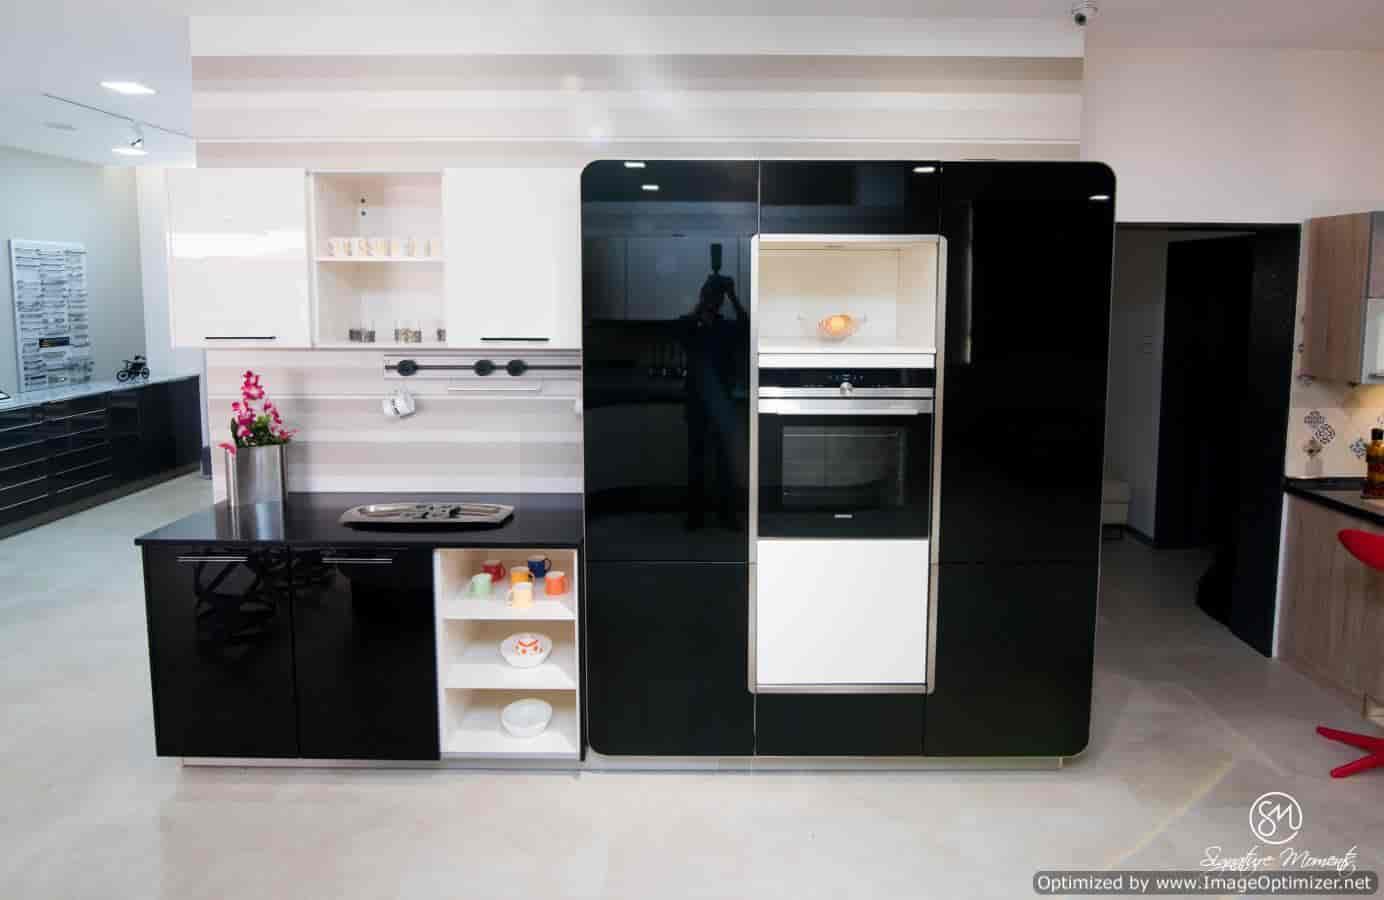 Hacker Modular Kitchens, RS Puram Coimbatore - Modular Kitchen